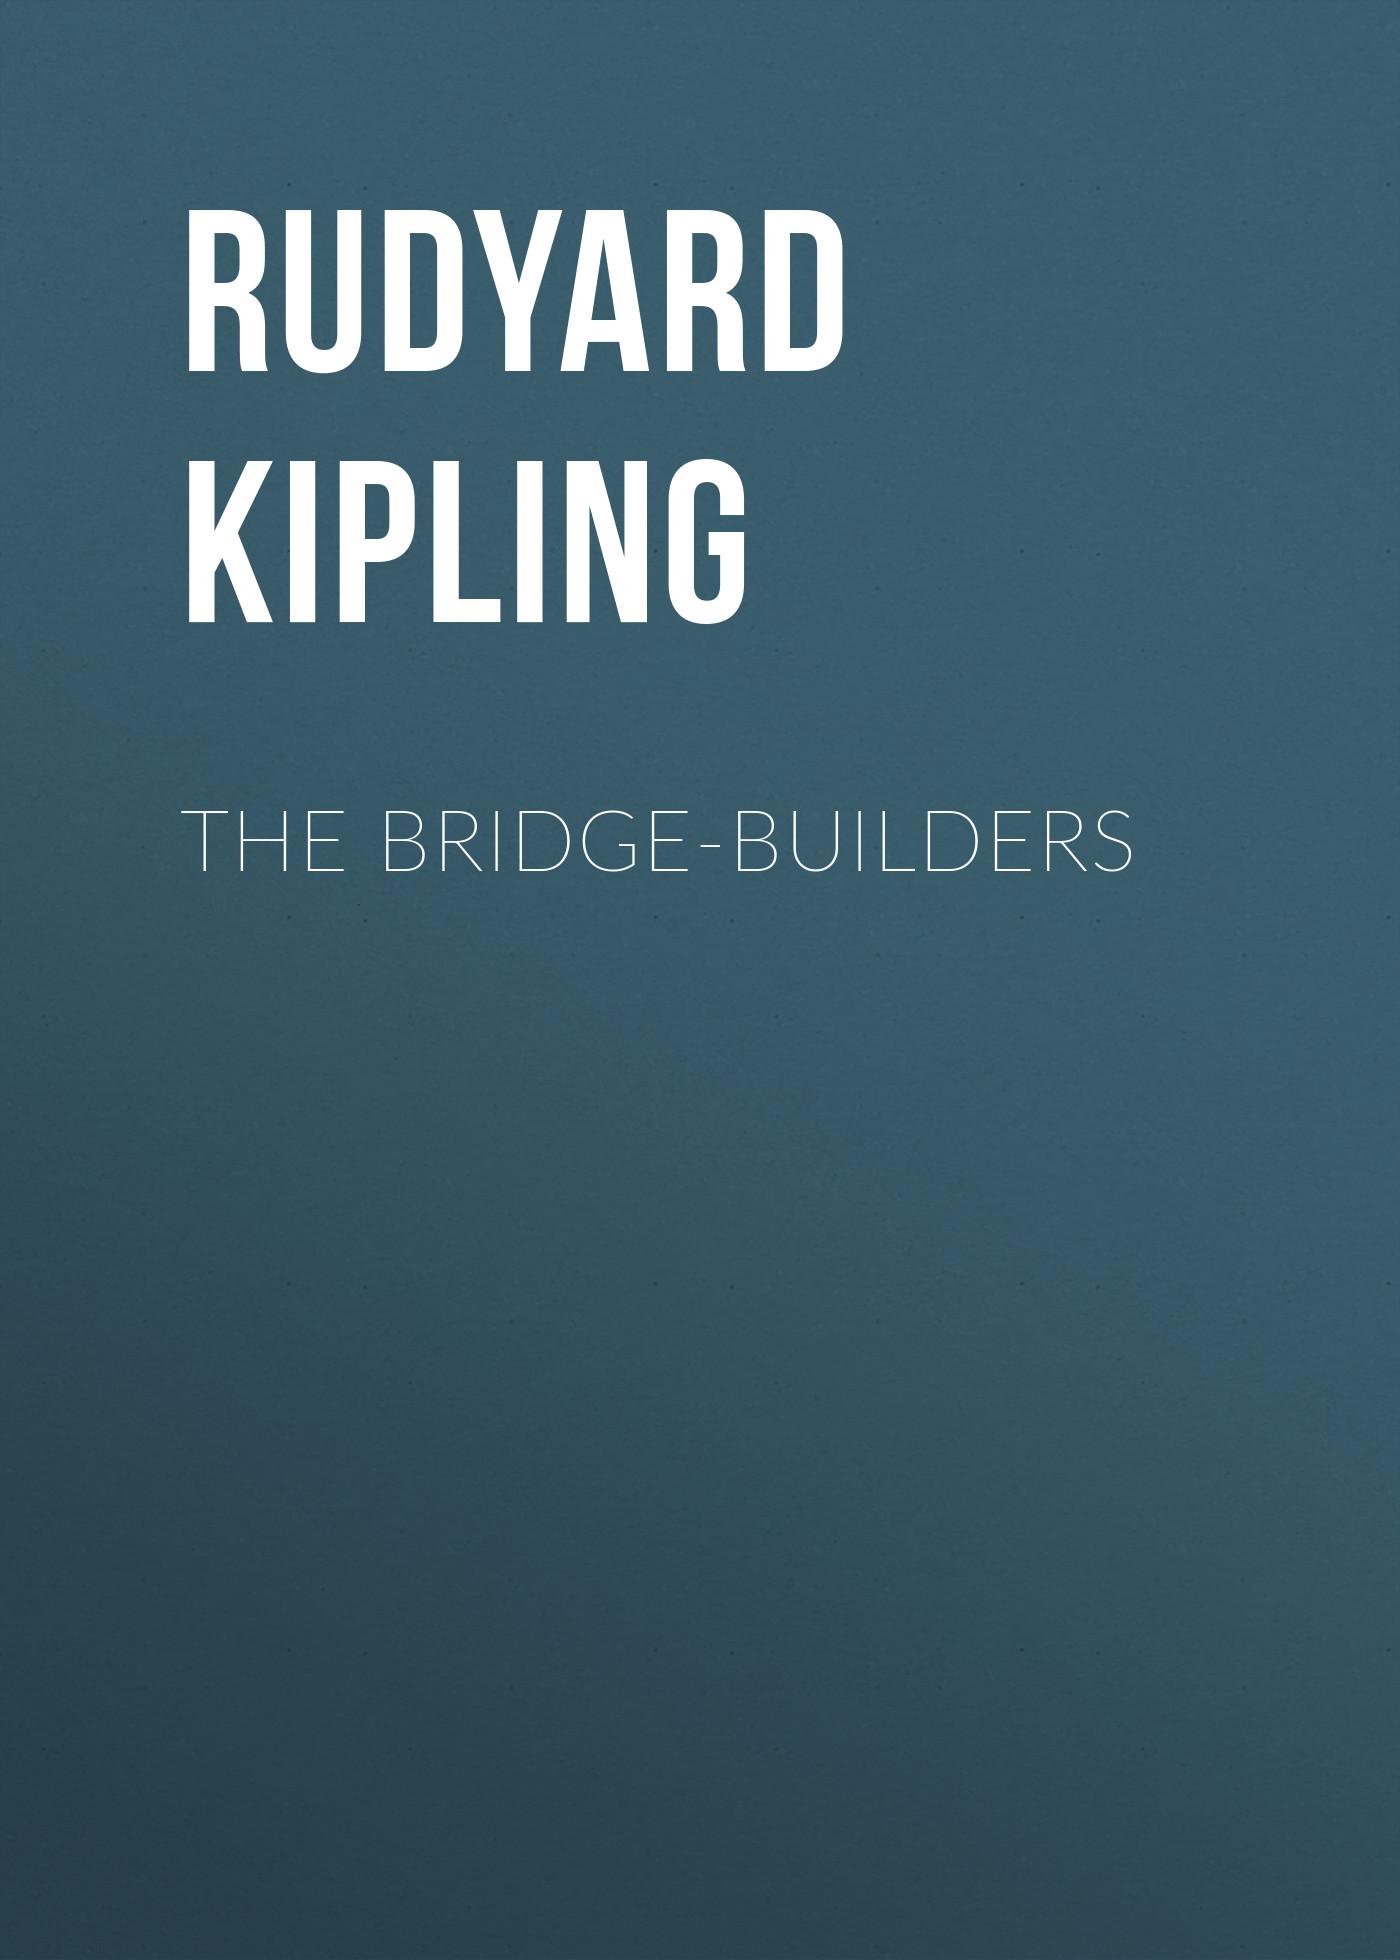 Редьярд Киплинг The Bridge-Builders bridge builders